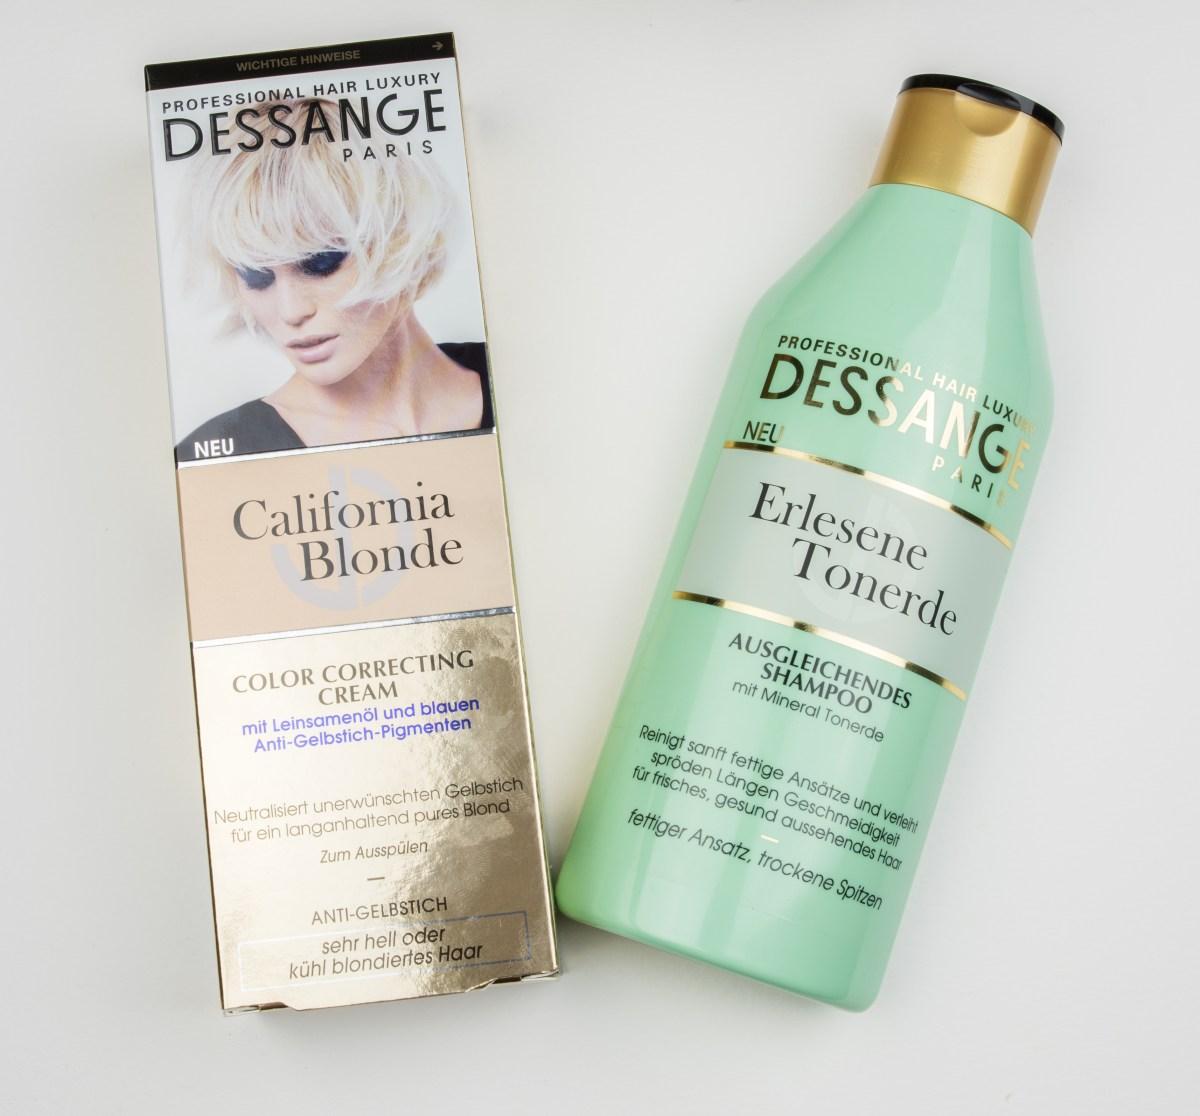 Review – Dessange Shampoo Erlesene Tonerde